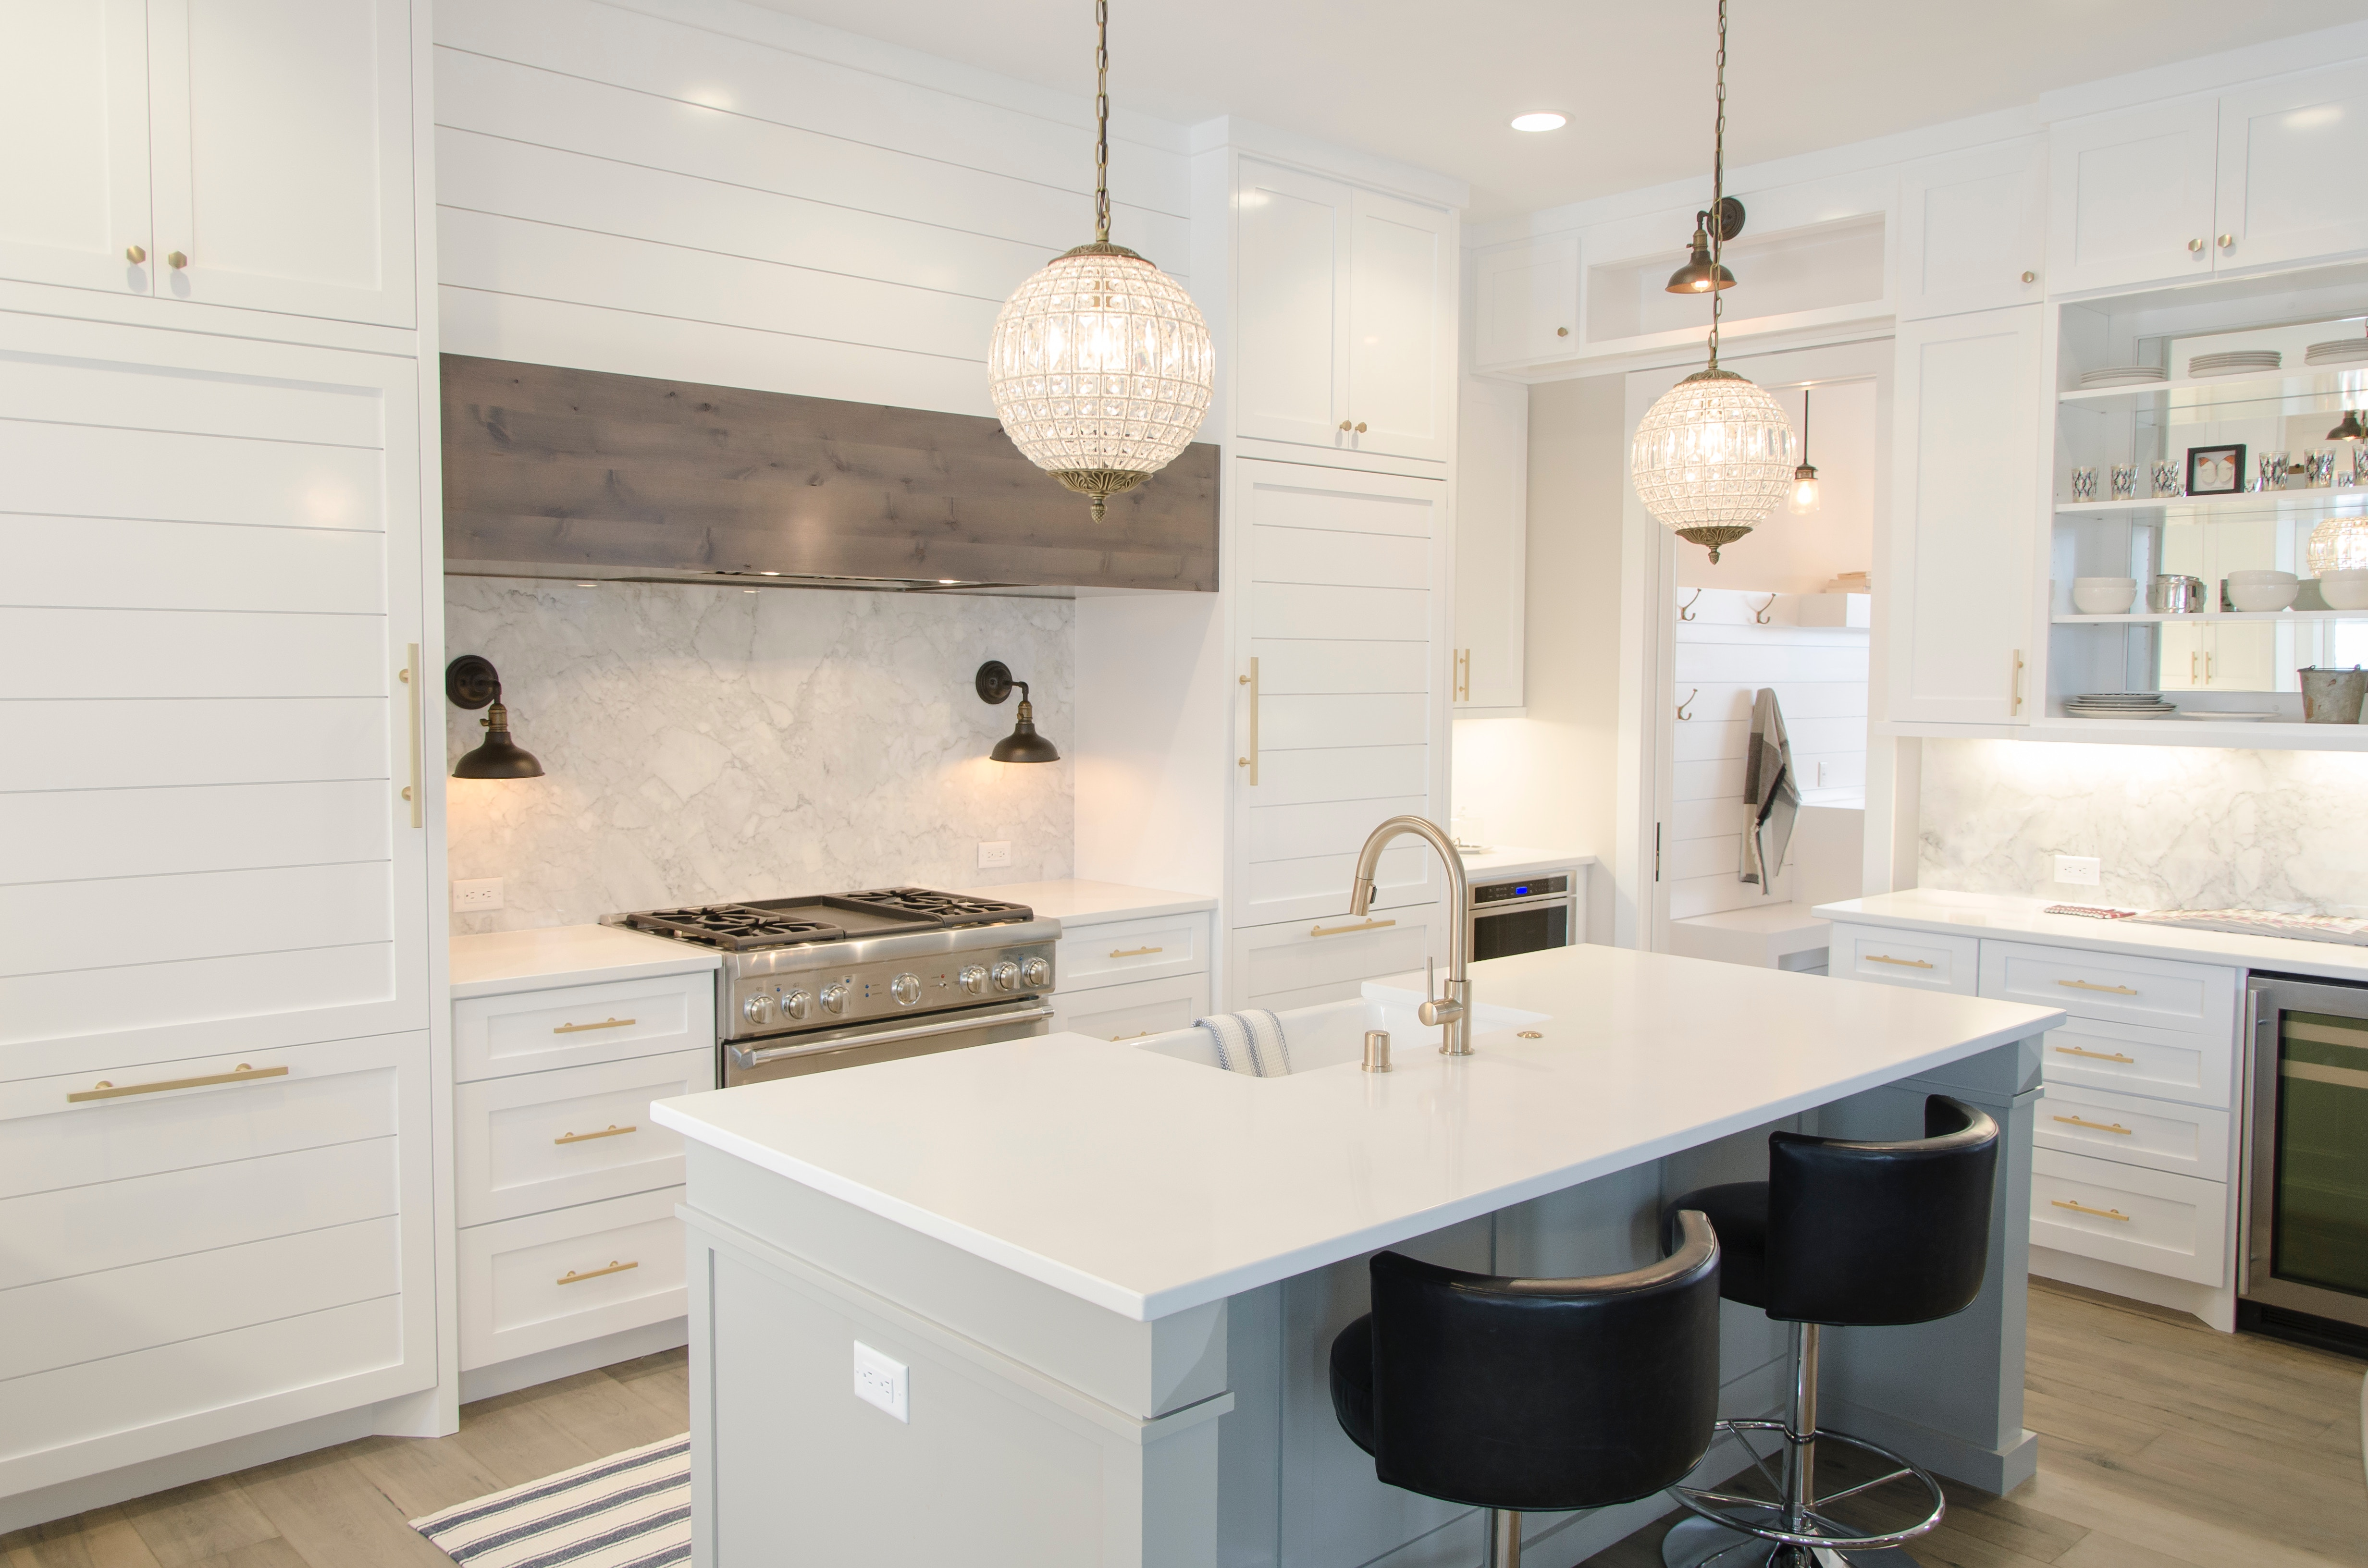 Kitchen Remodeling | Dream Kitchen and Baths